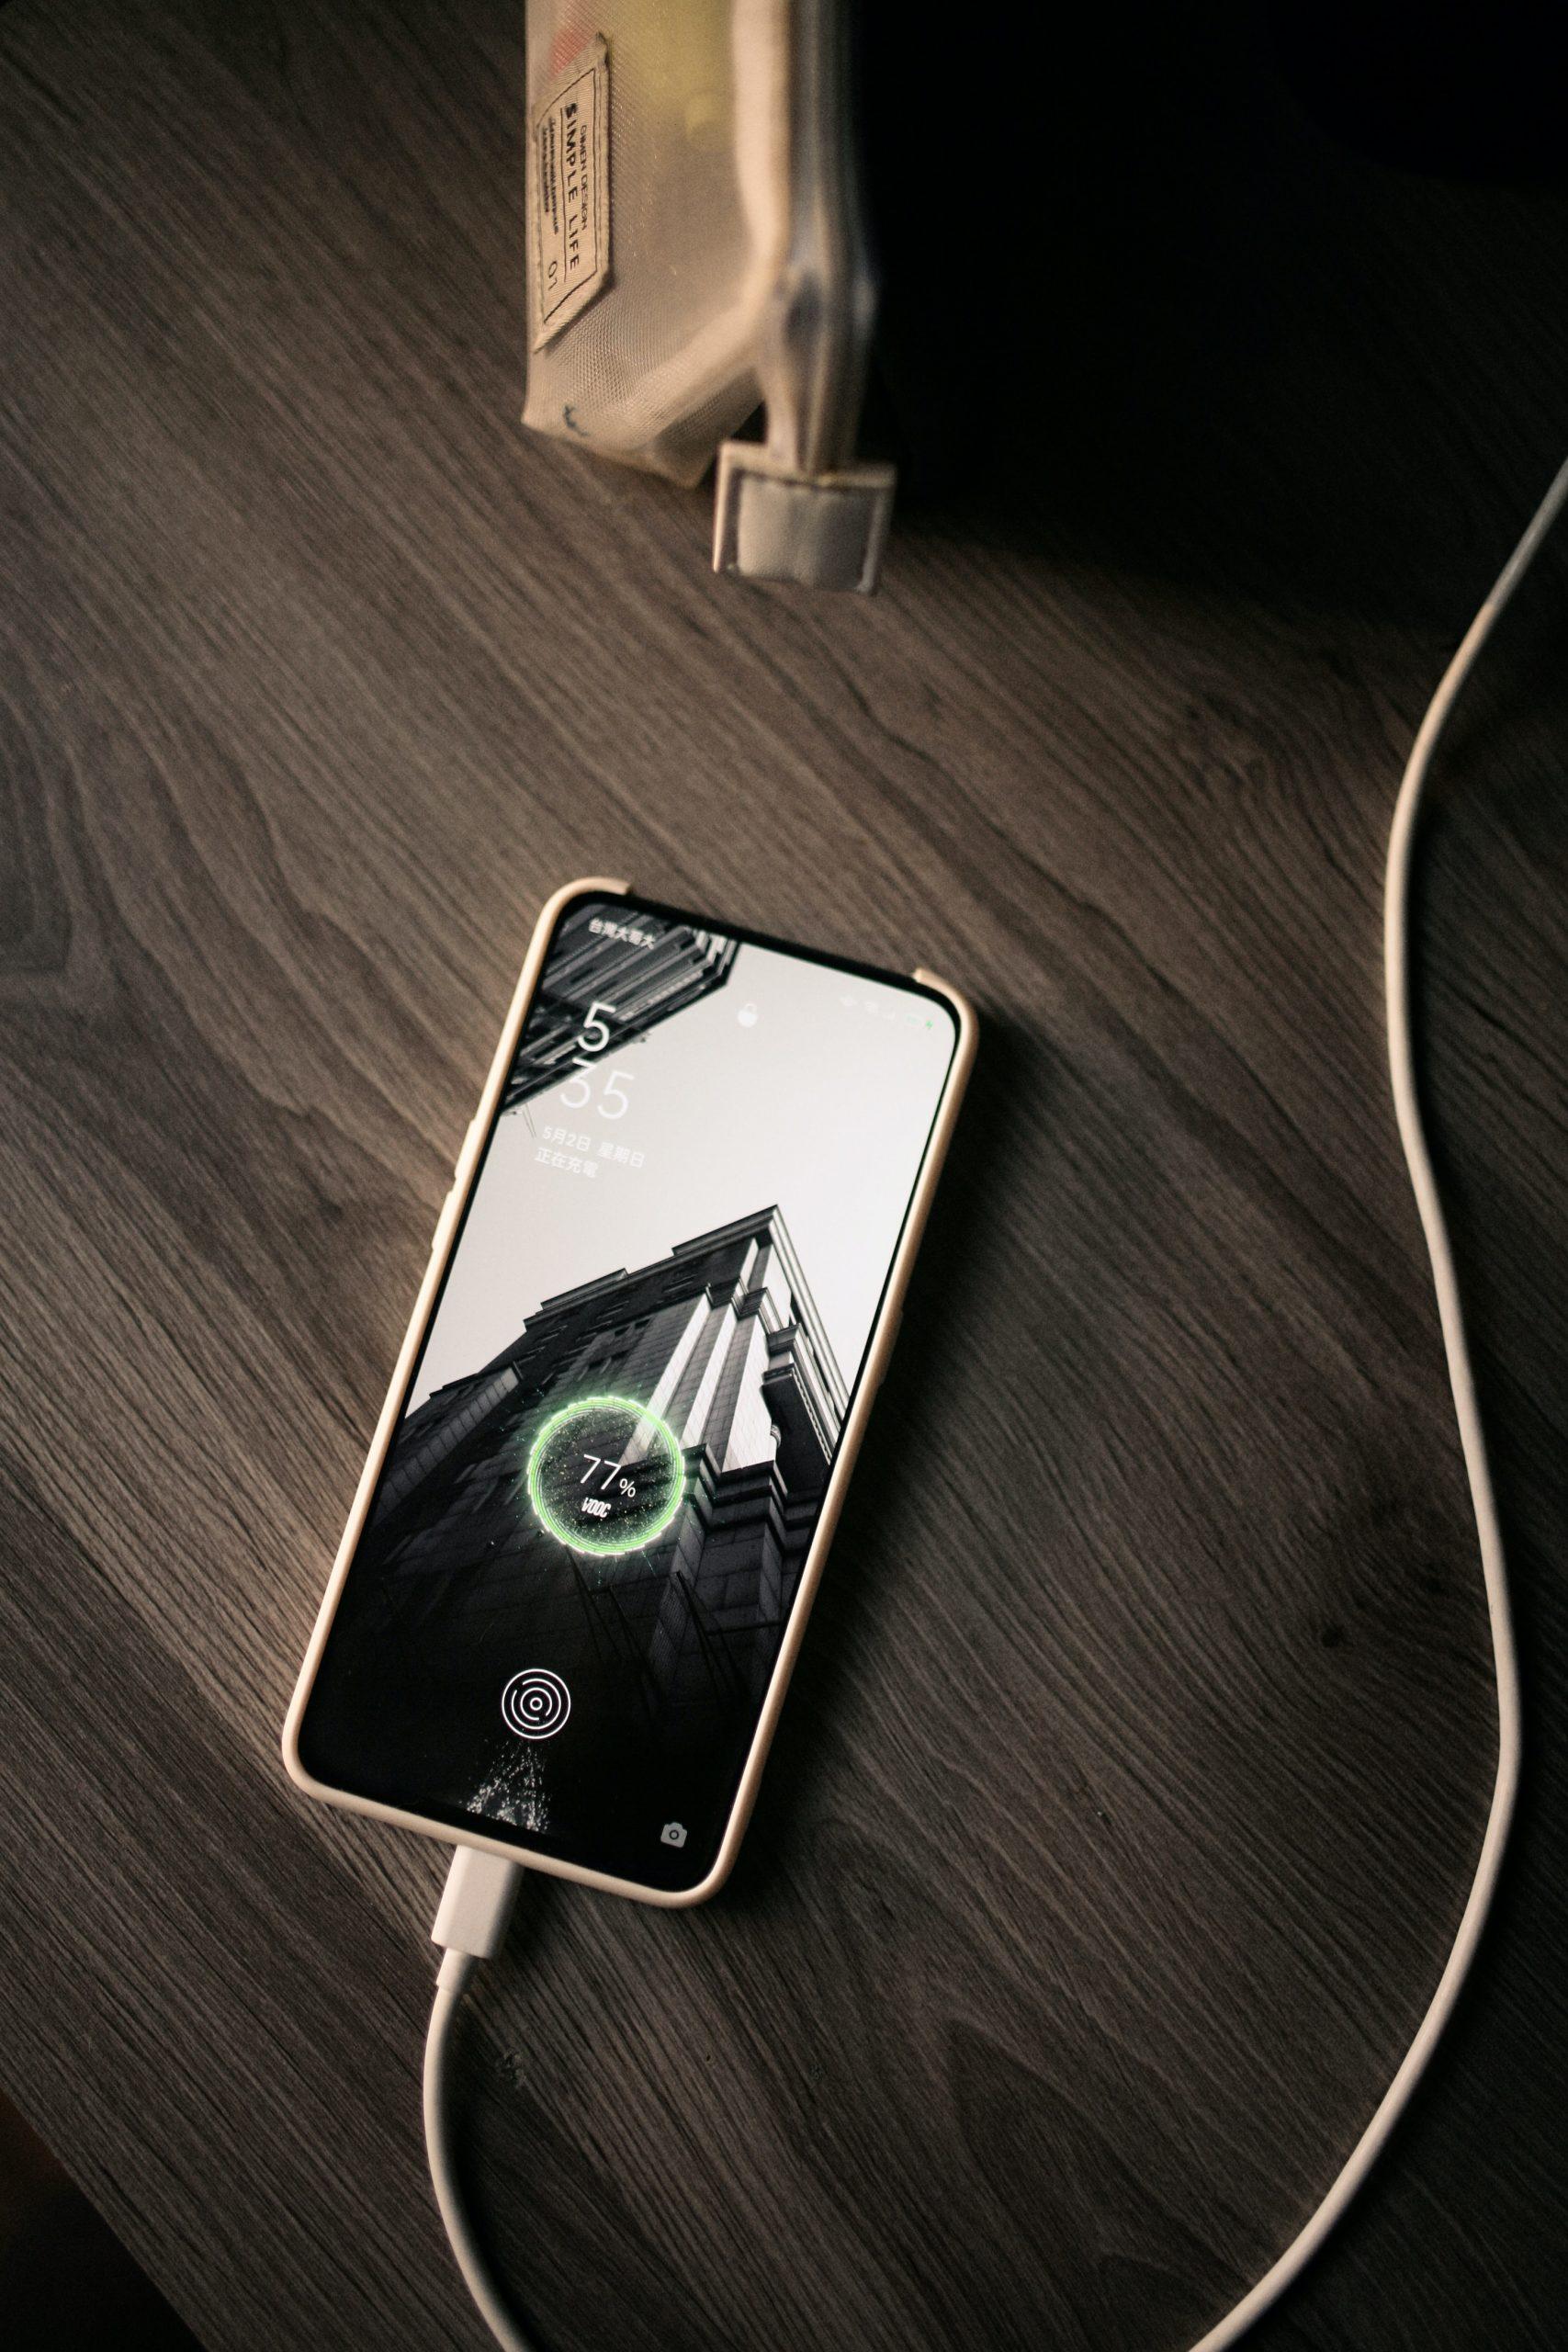 phone battery charging